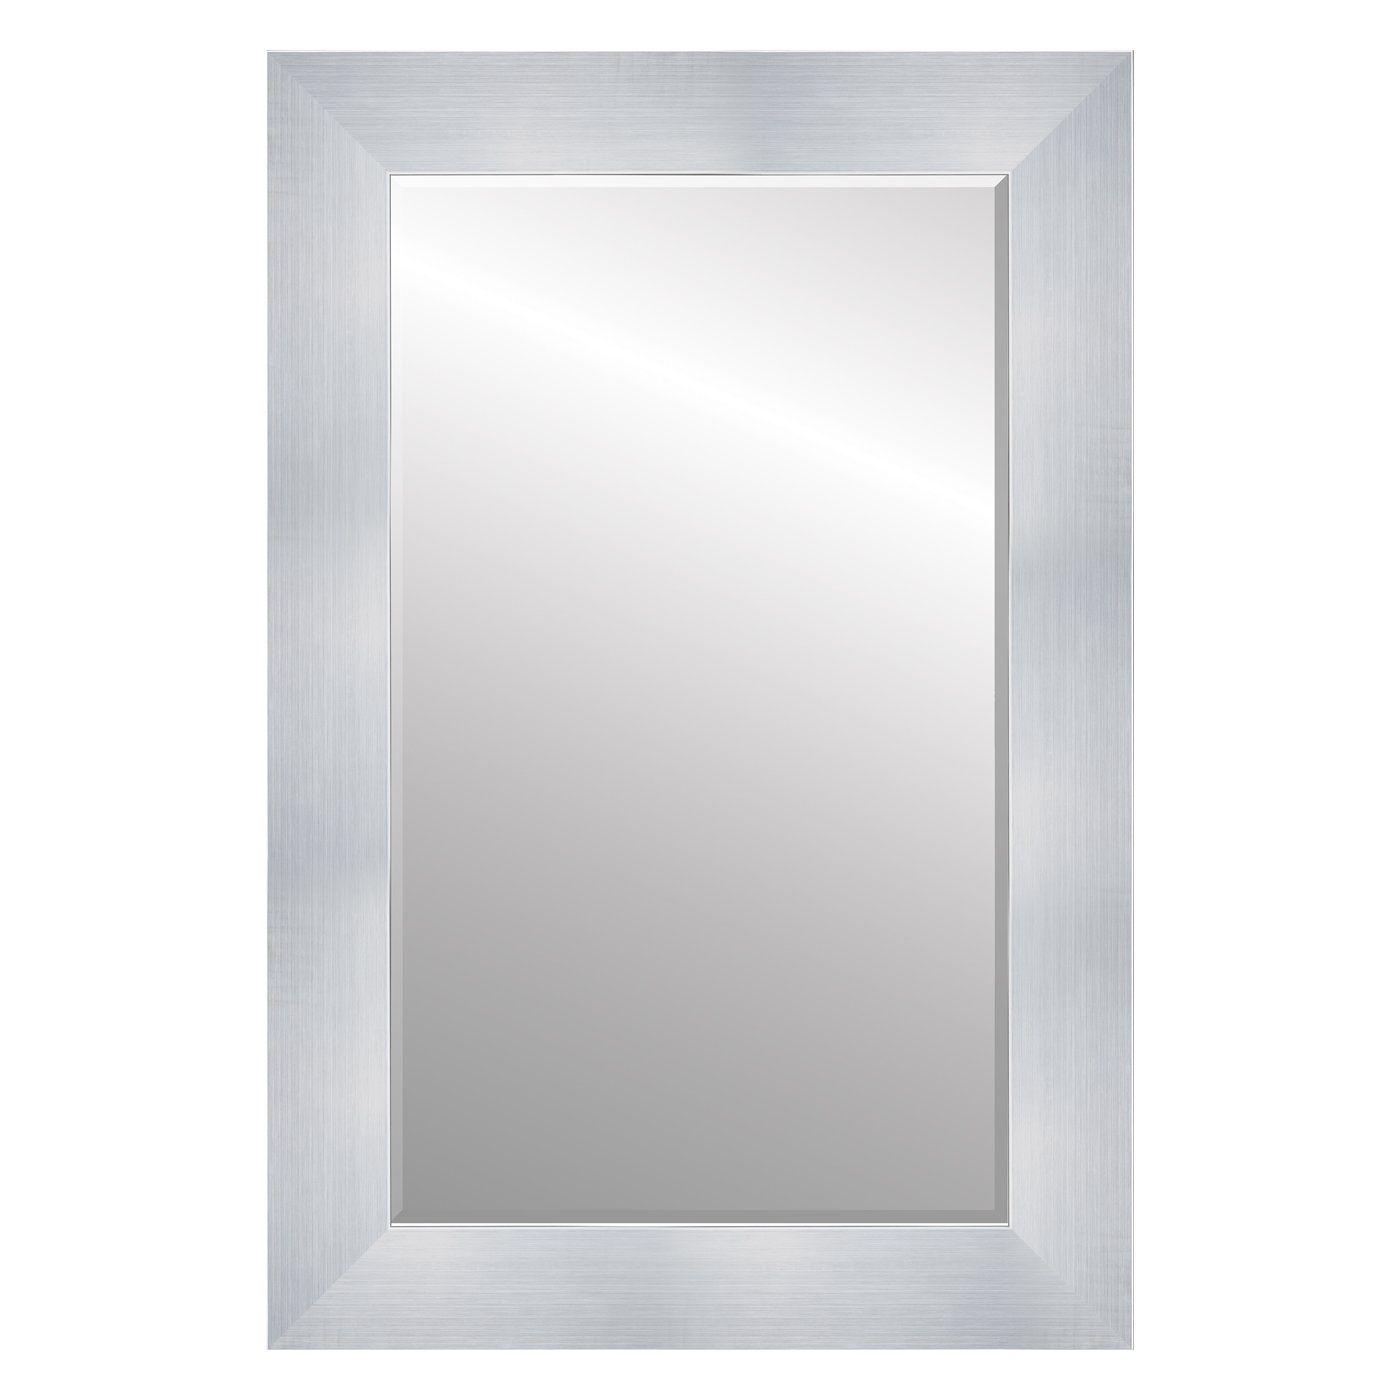 Shop Roma 59154M Ramino 2 3/4-in Titanium Silver Framed Wall Mirror ...